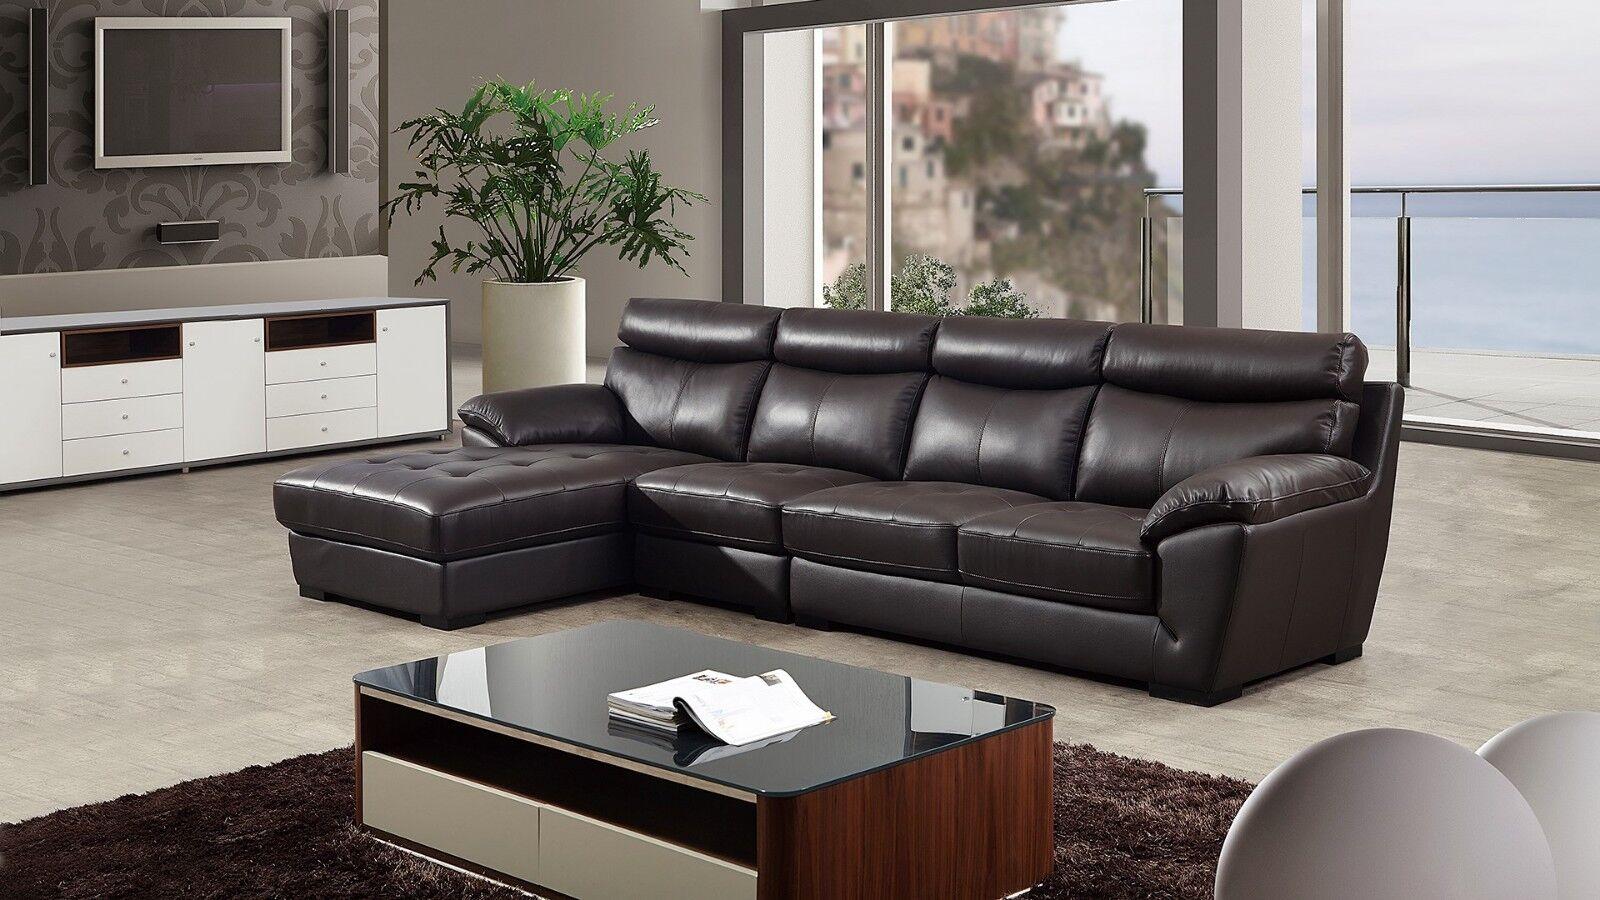 3 PC Modern Dark Brown Italian Top Grain Leather Sectional Sofa Chaise  Chair Set